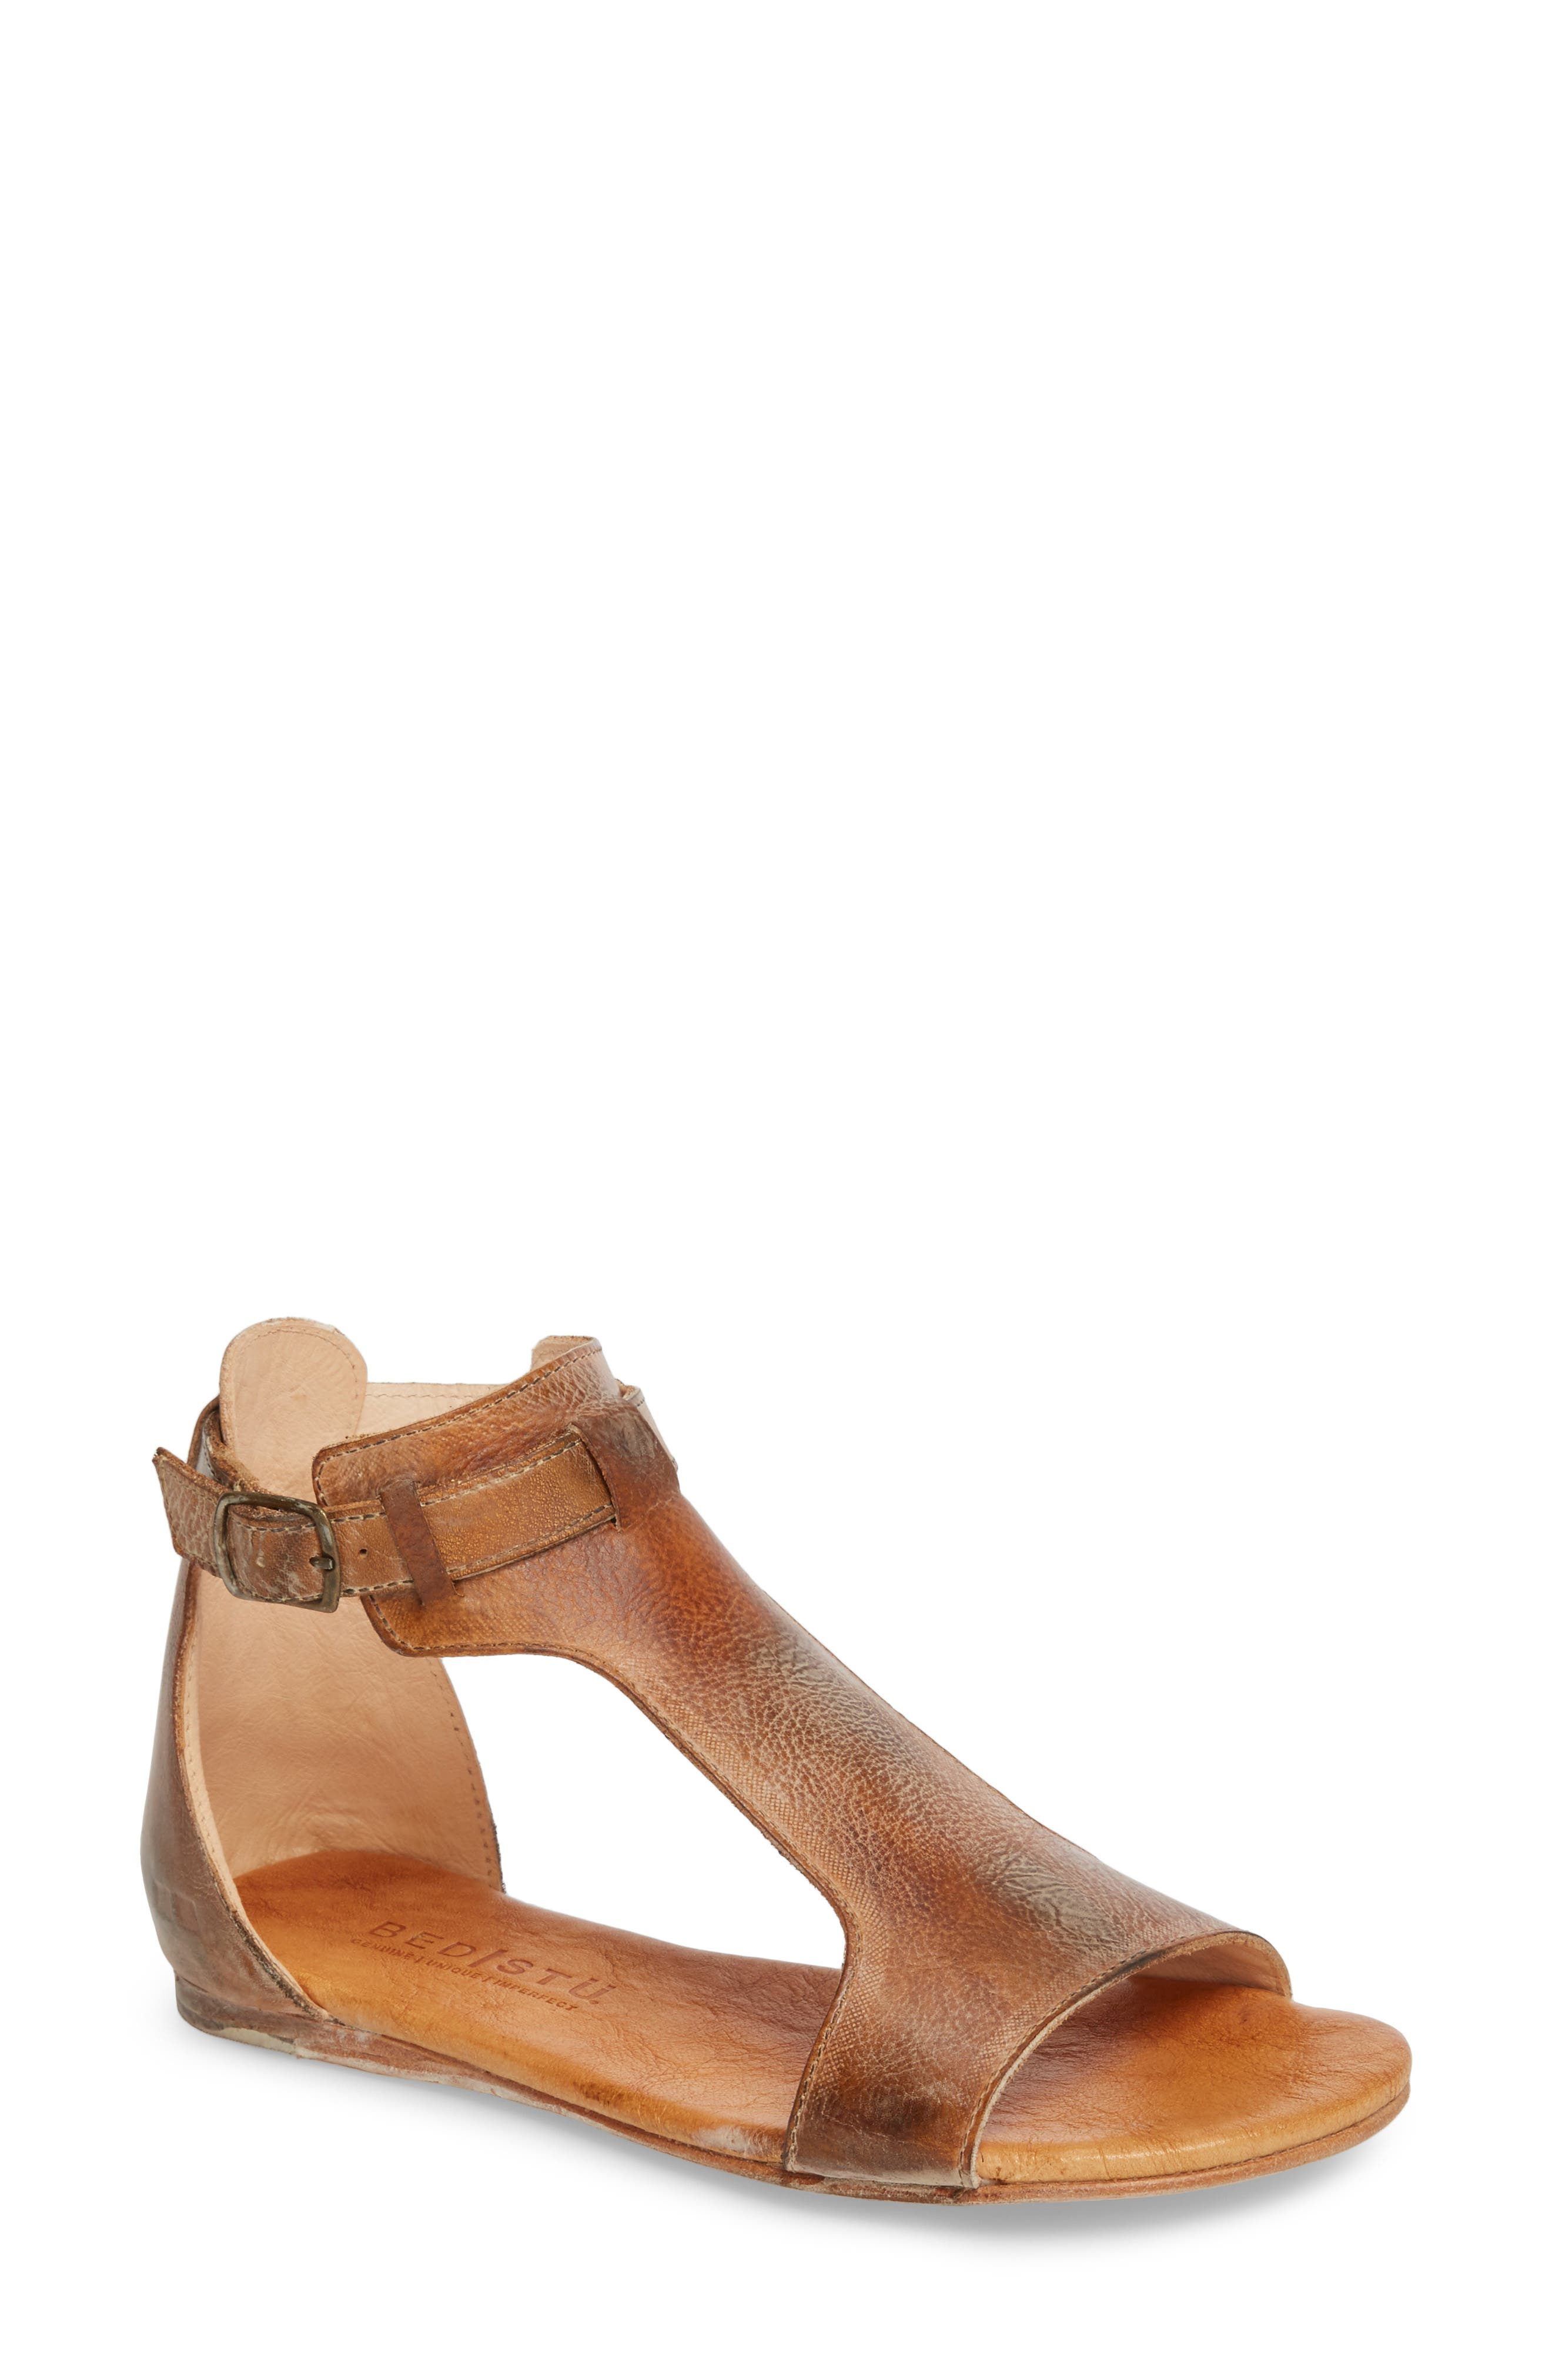 Sable Sandal,                         Main,                         color, TAN/ WHITE LEATHER